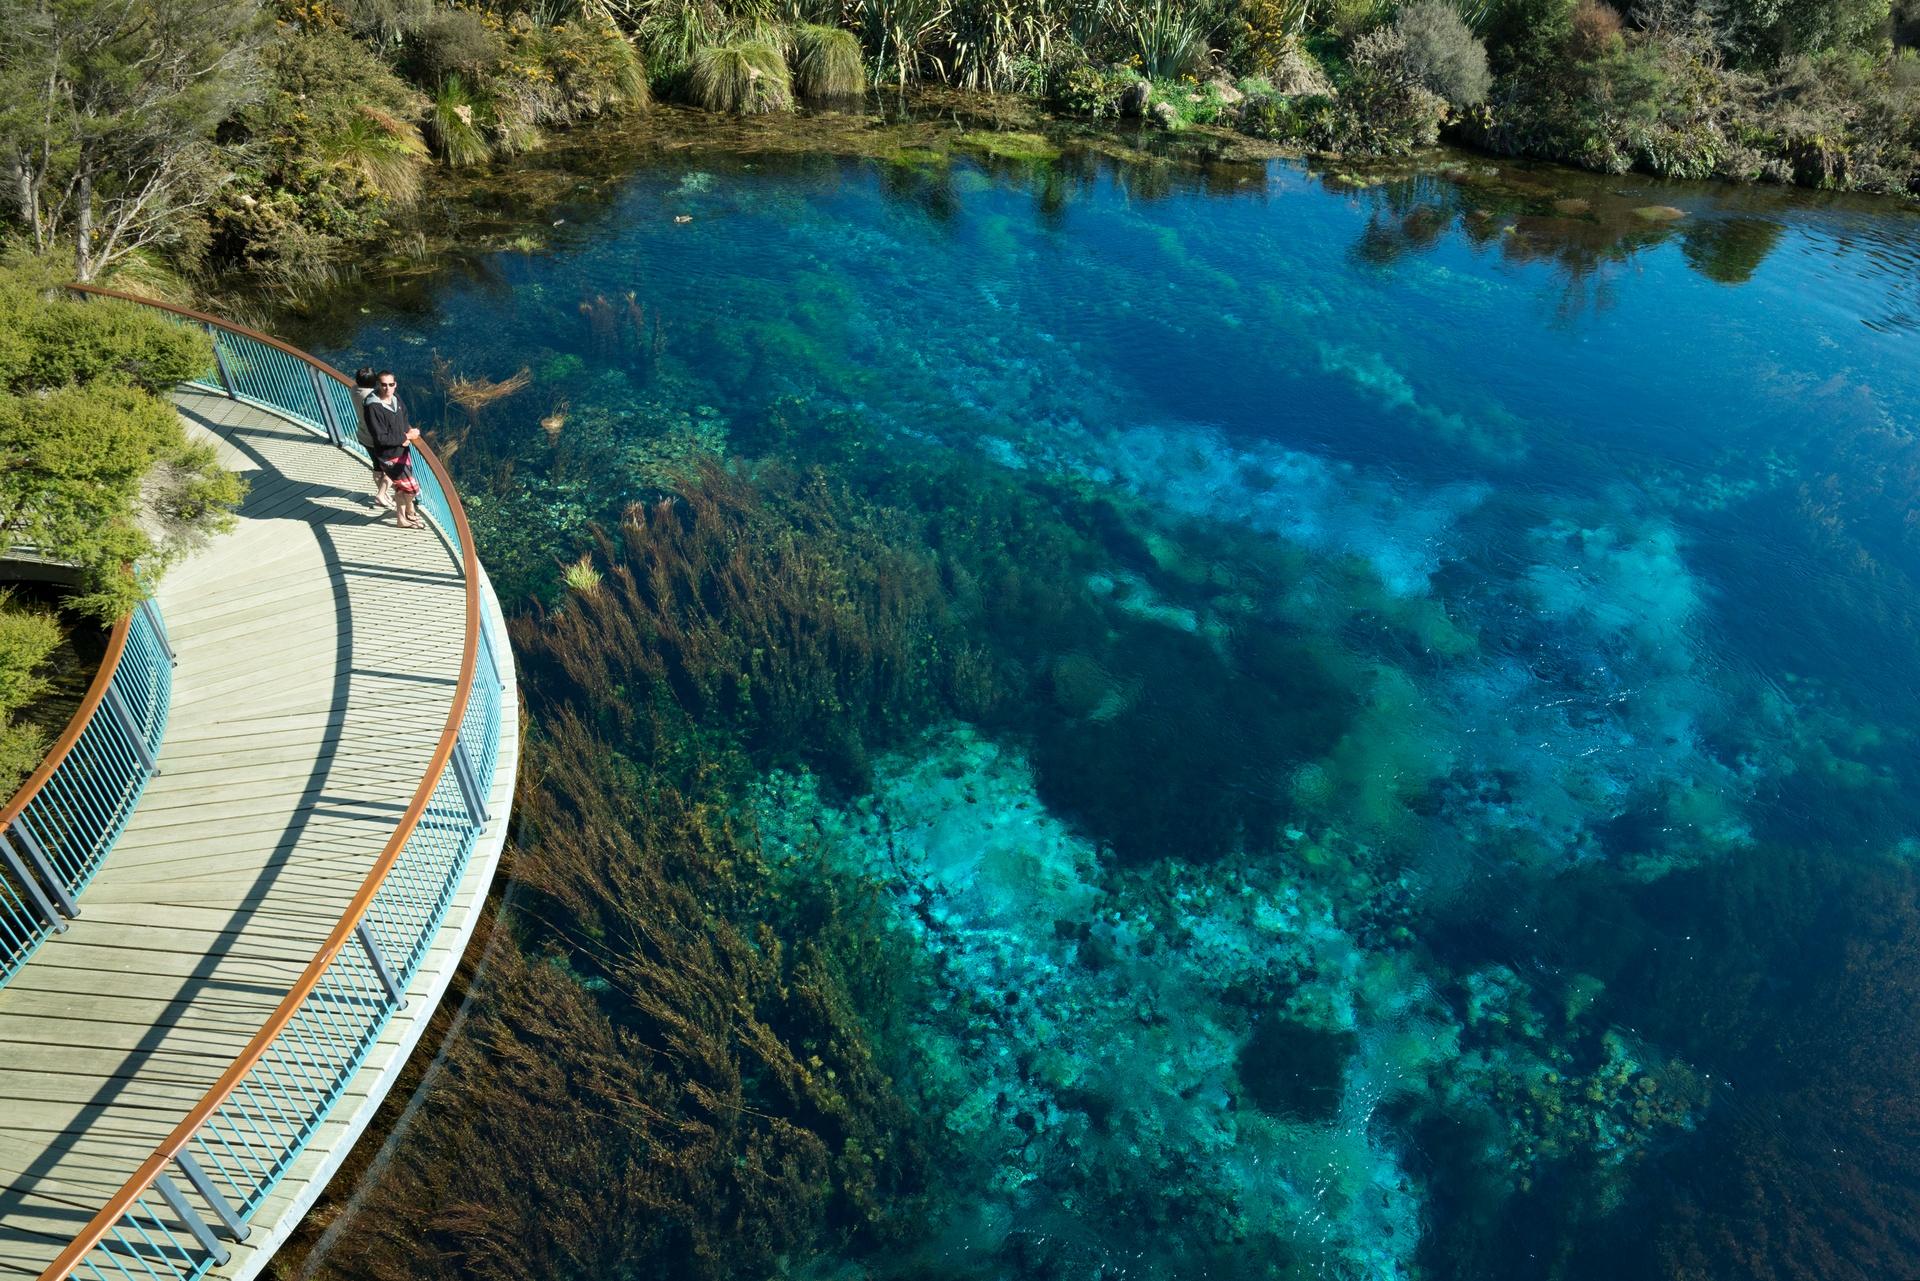 Te Waikoropupu Springs near Nelson. Image courtesy Craig Parry and nelsontasman.nz